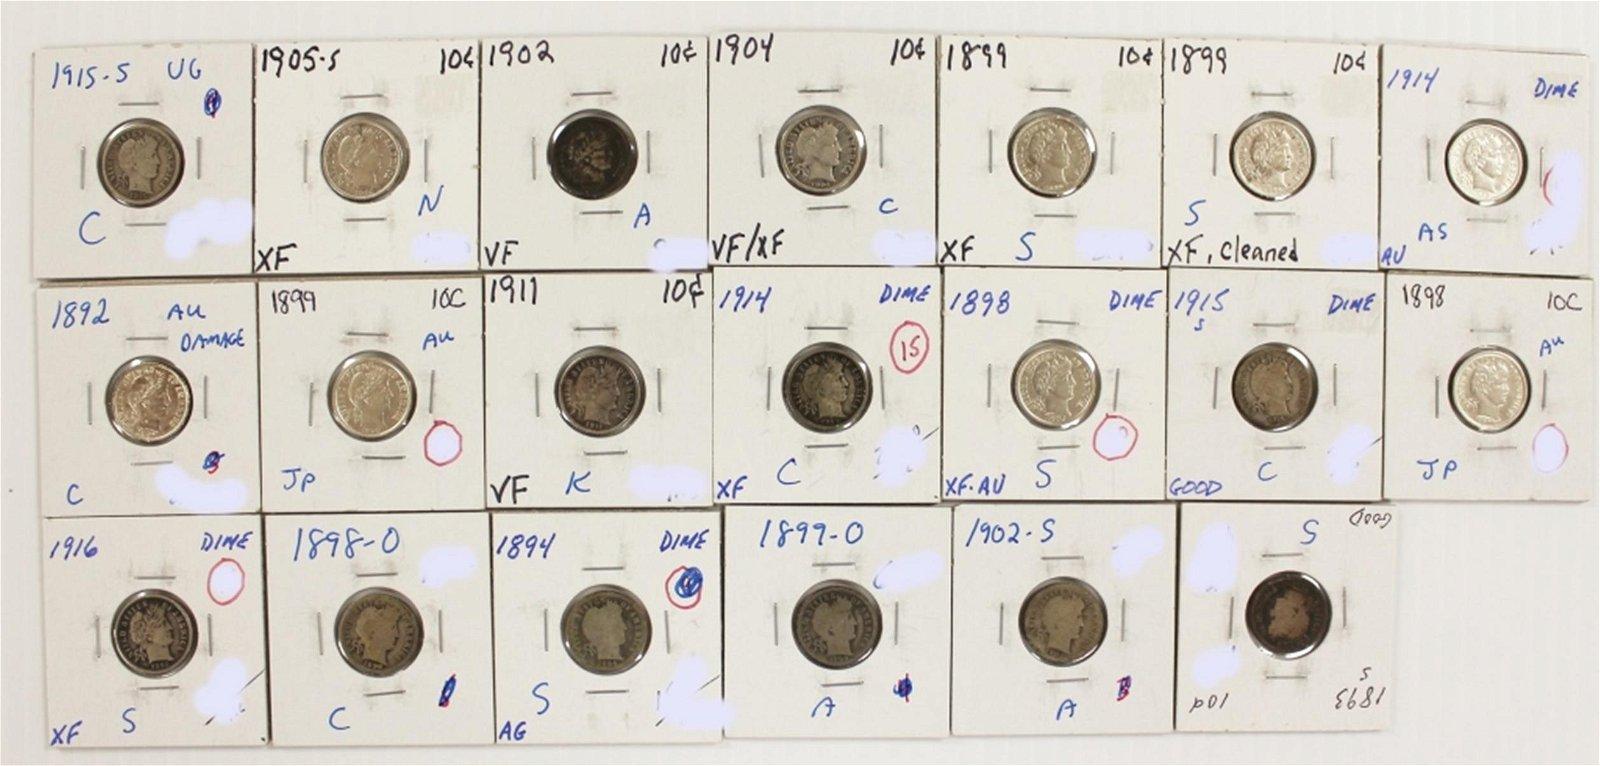 BARBER DIME LOT: 20 COINS TOTAL SEE DESCRIPTION